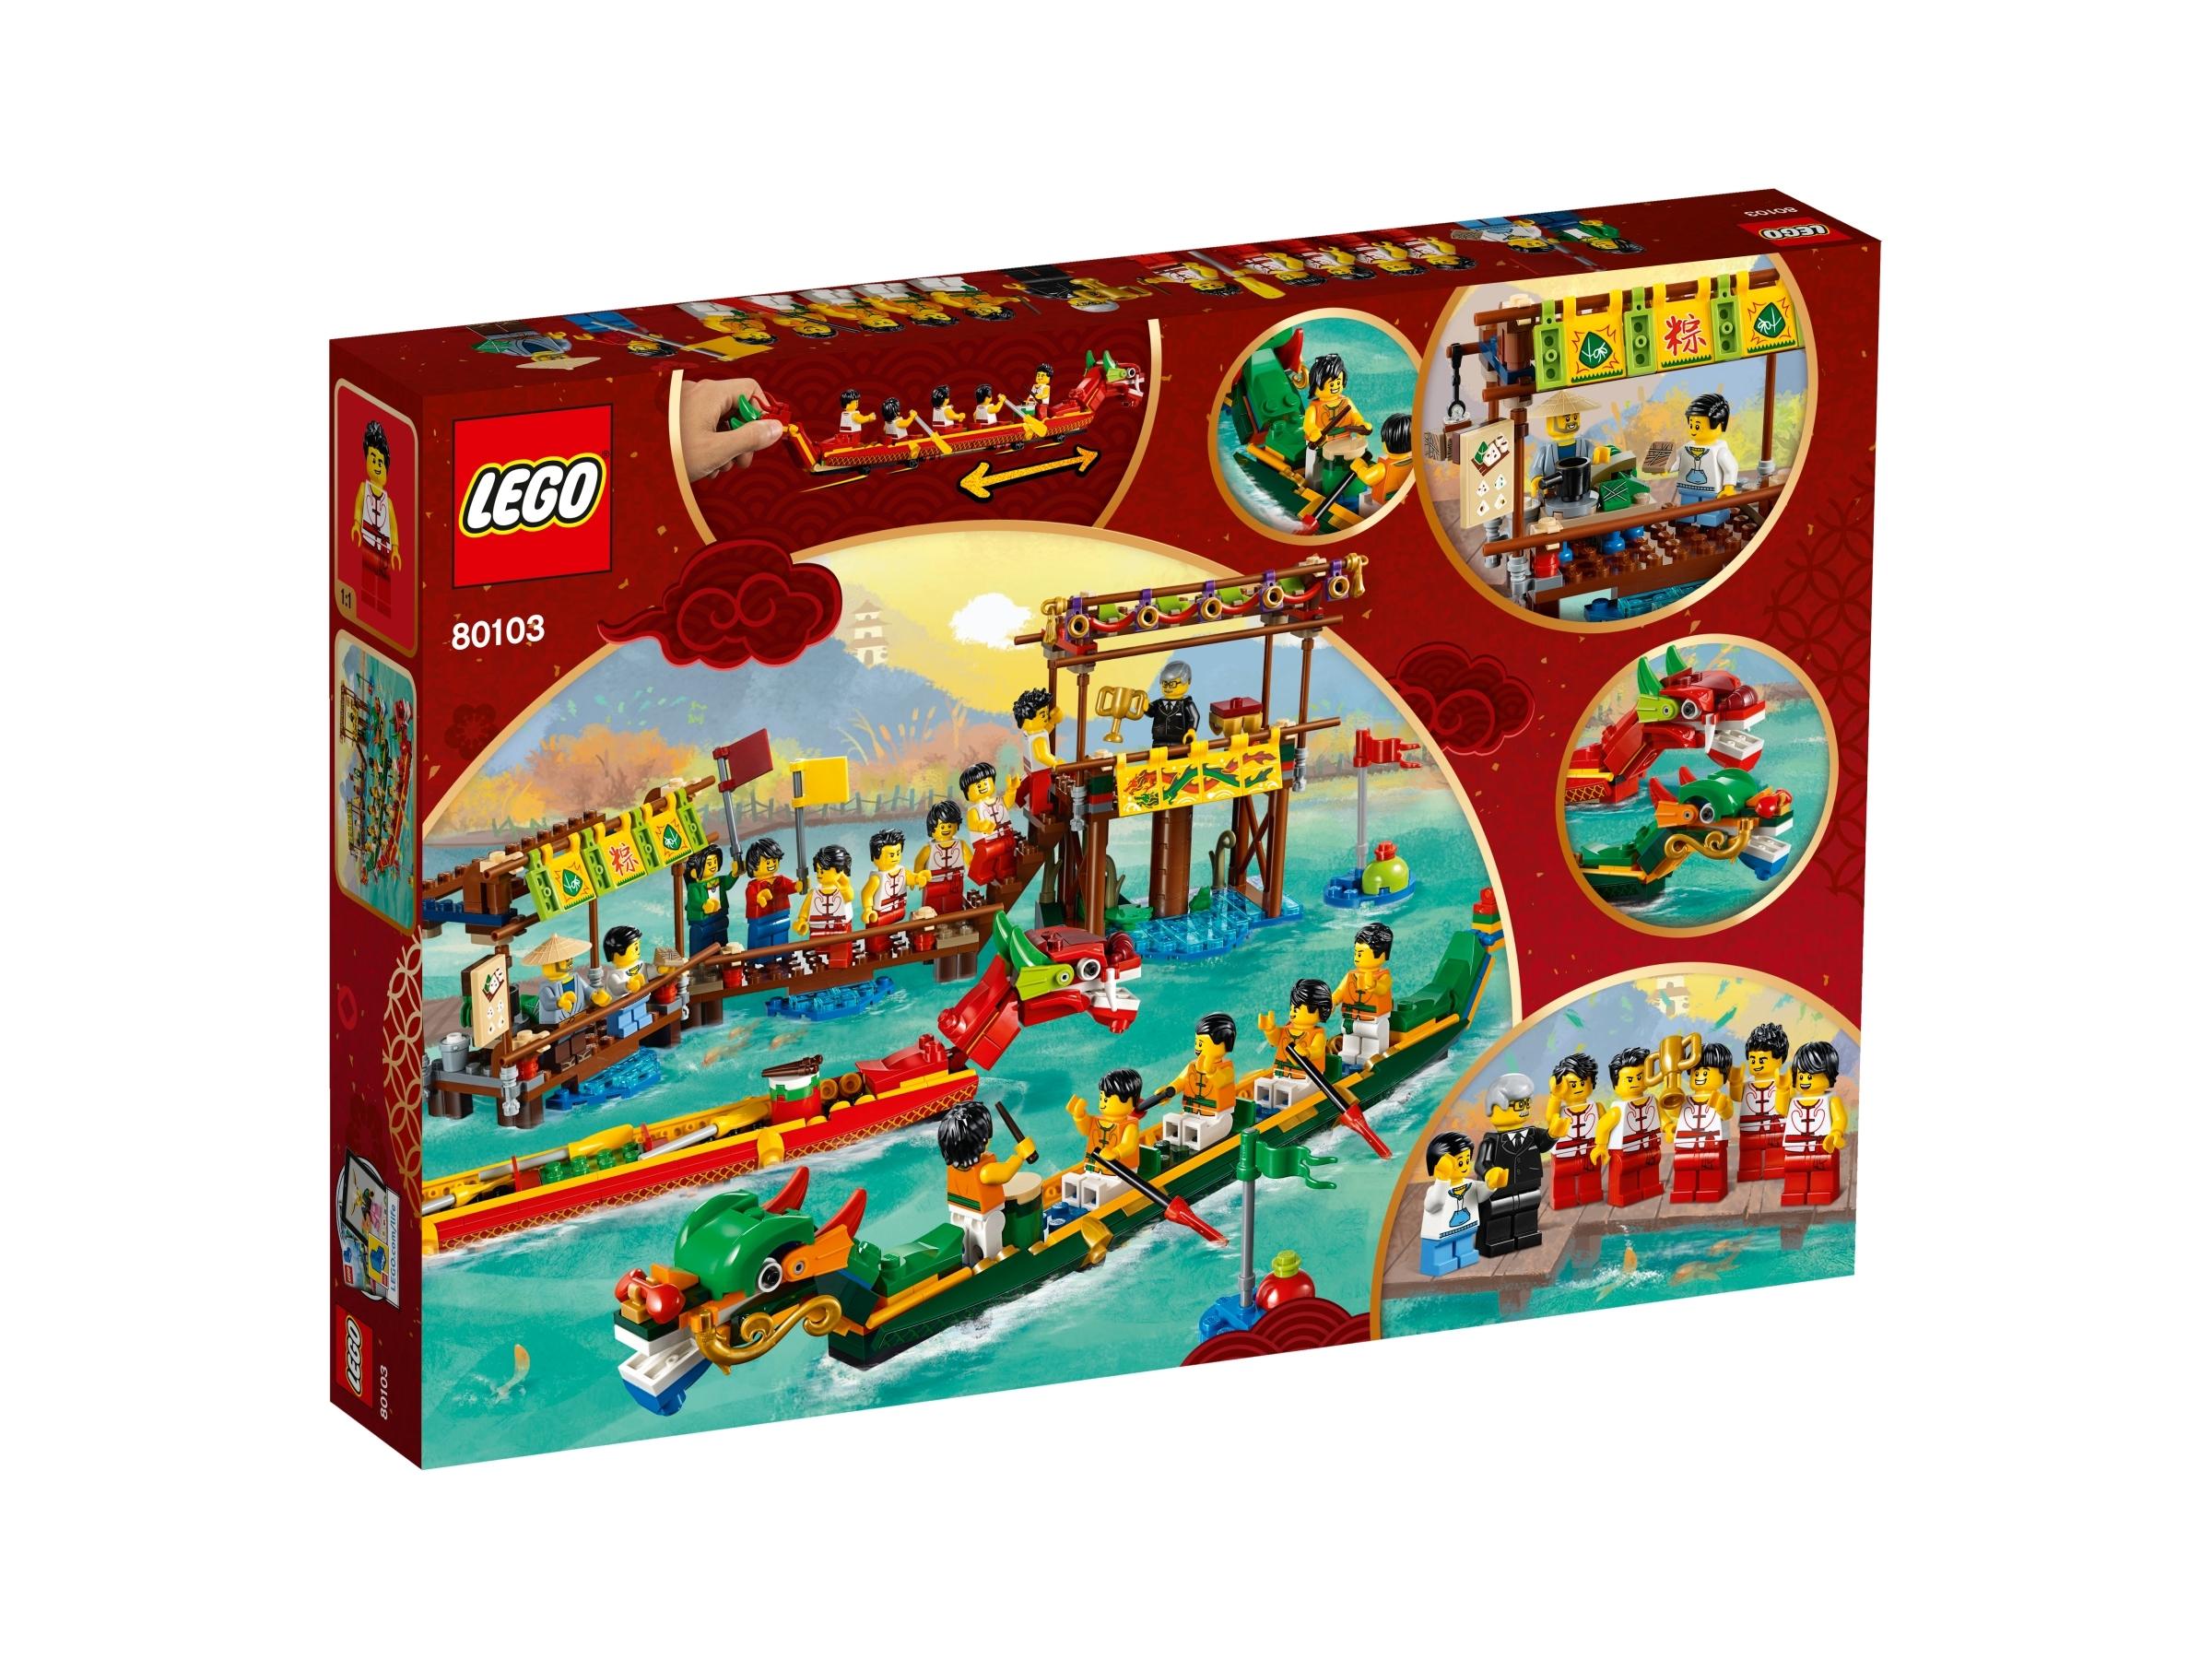 NEW LEGO Seasonal Chinese Festival Dragon Boat Race 80103